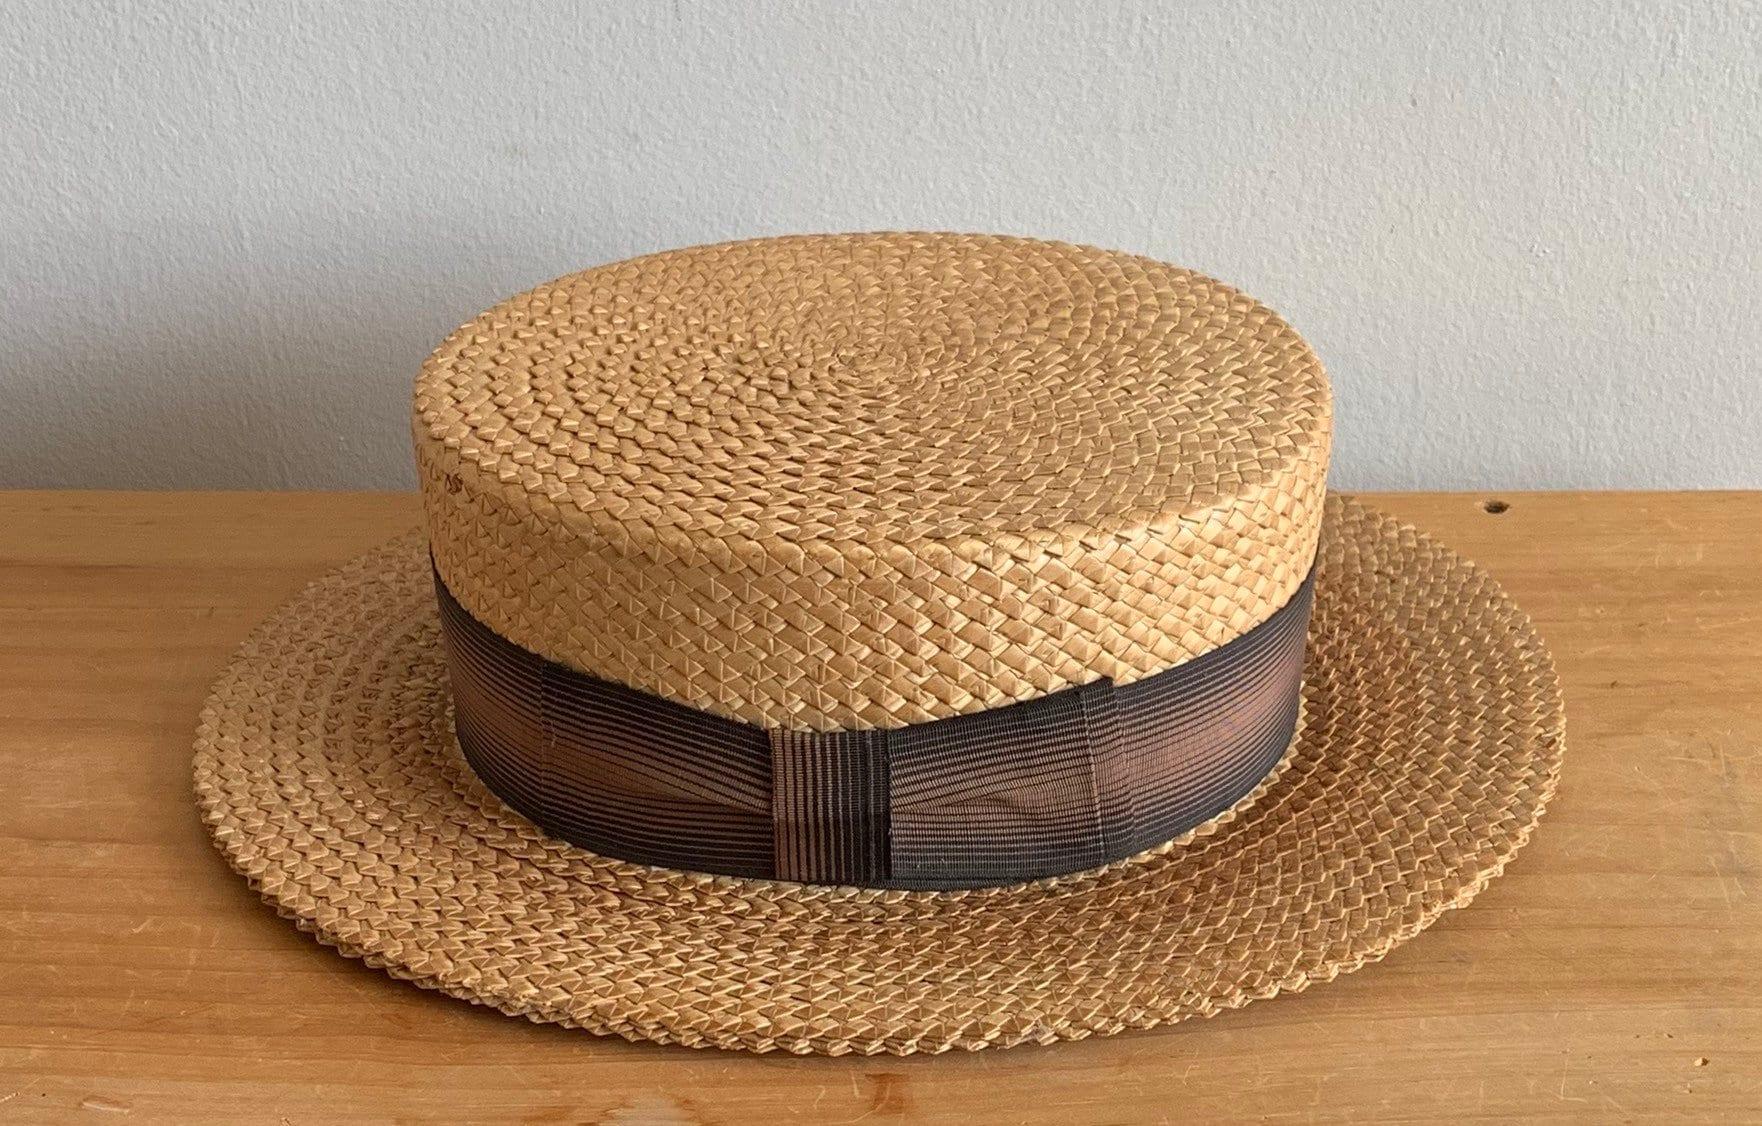 5a7225302f4 1910s 1920s Men s Boater Hat Straw Hat Burk   Co Vintage